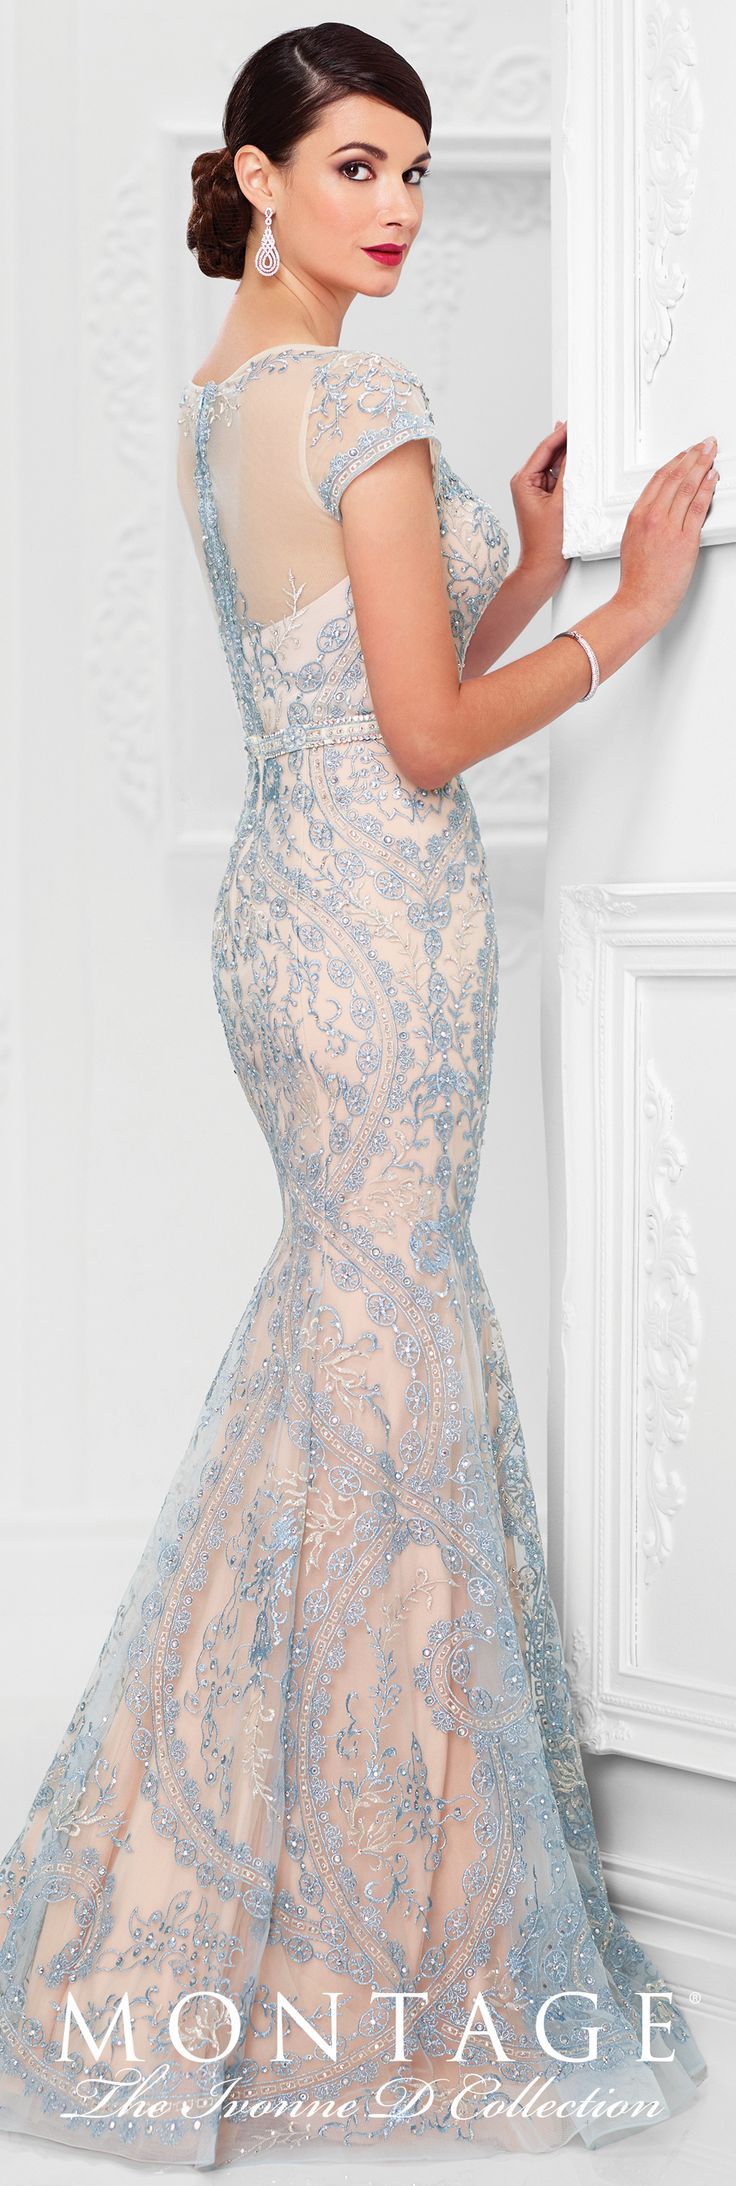 Best 10+ Evening gowns ideas on Pinterest | Elegant evening gowns ...